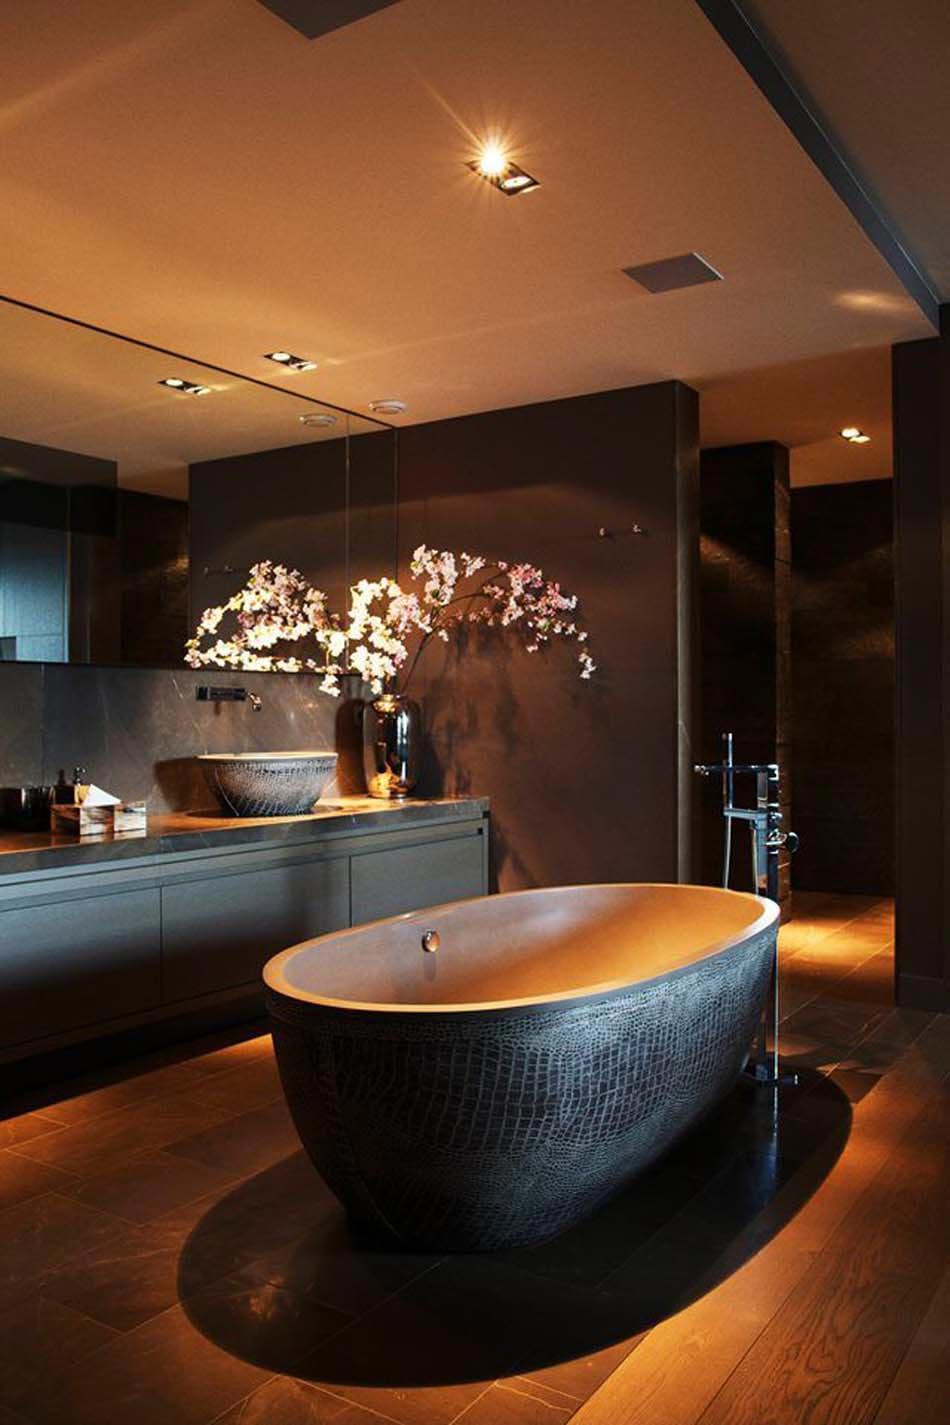 Salle De Bain Asiatique tout personnaliser sa salle de bain design avec un look extravagant ou